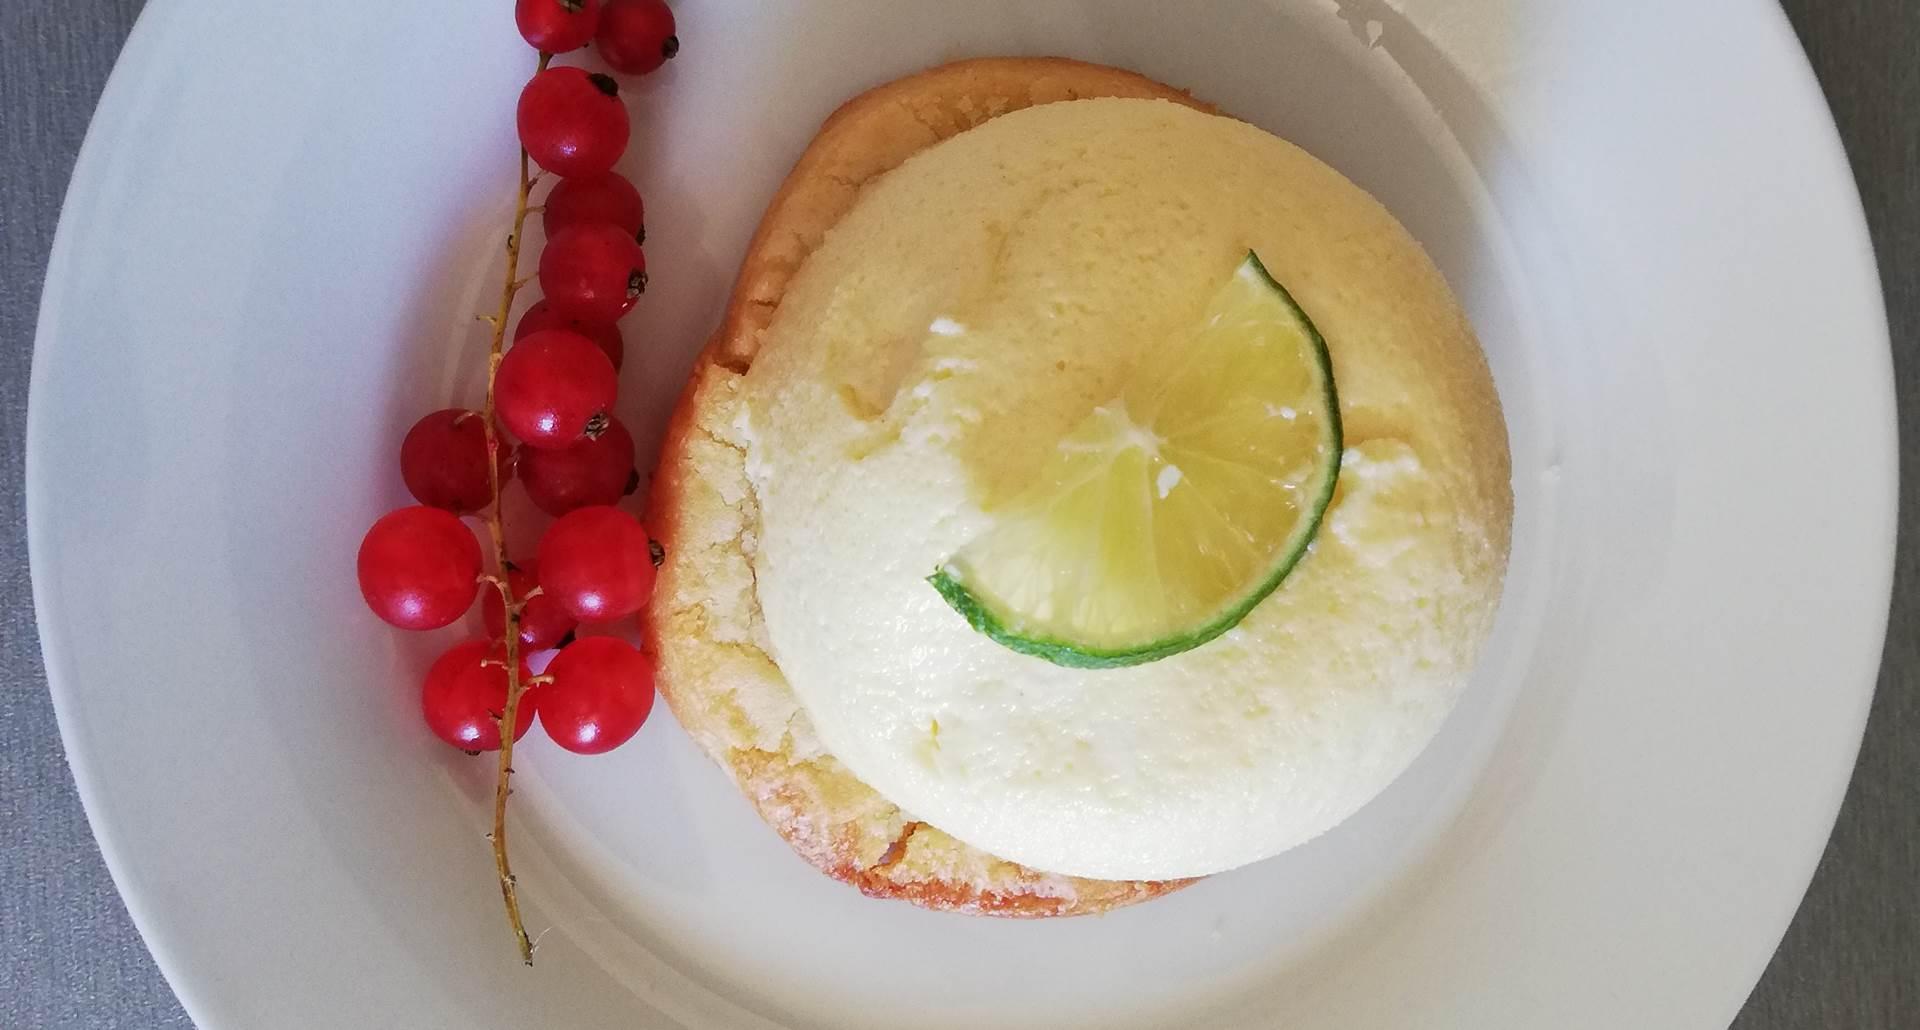 Cheese cake au citron vert maison